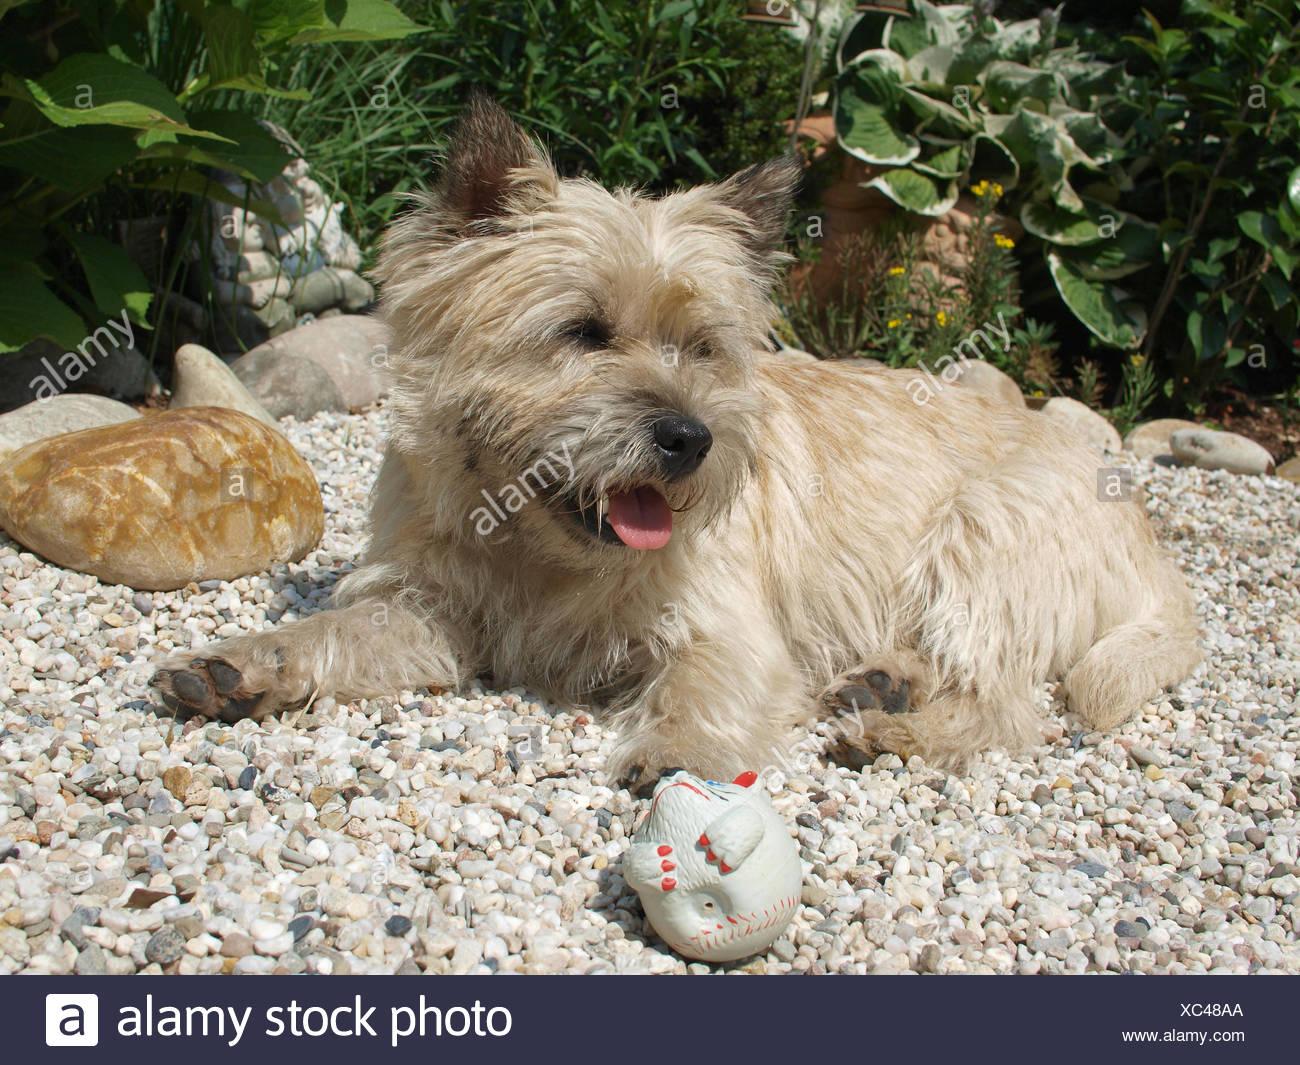 dog terrier species pedigree animal dog species pedigree cairn hunderasse cairn - Stock Image